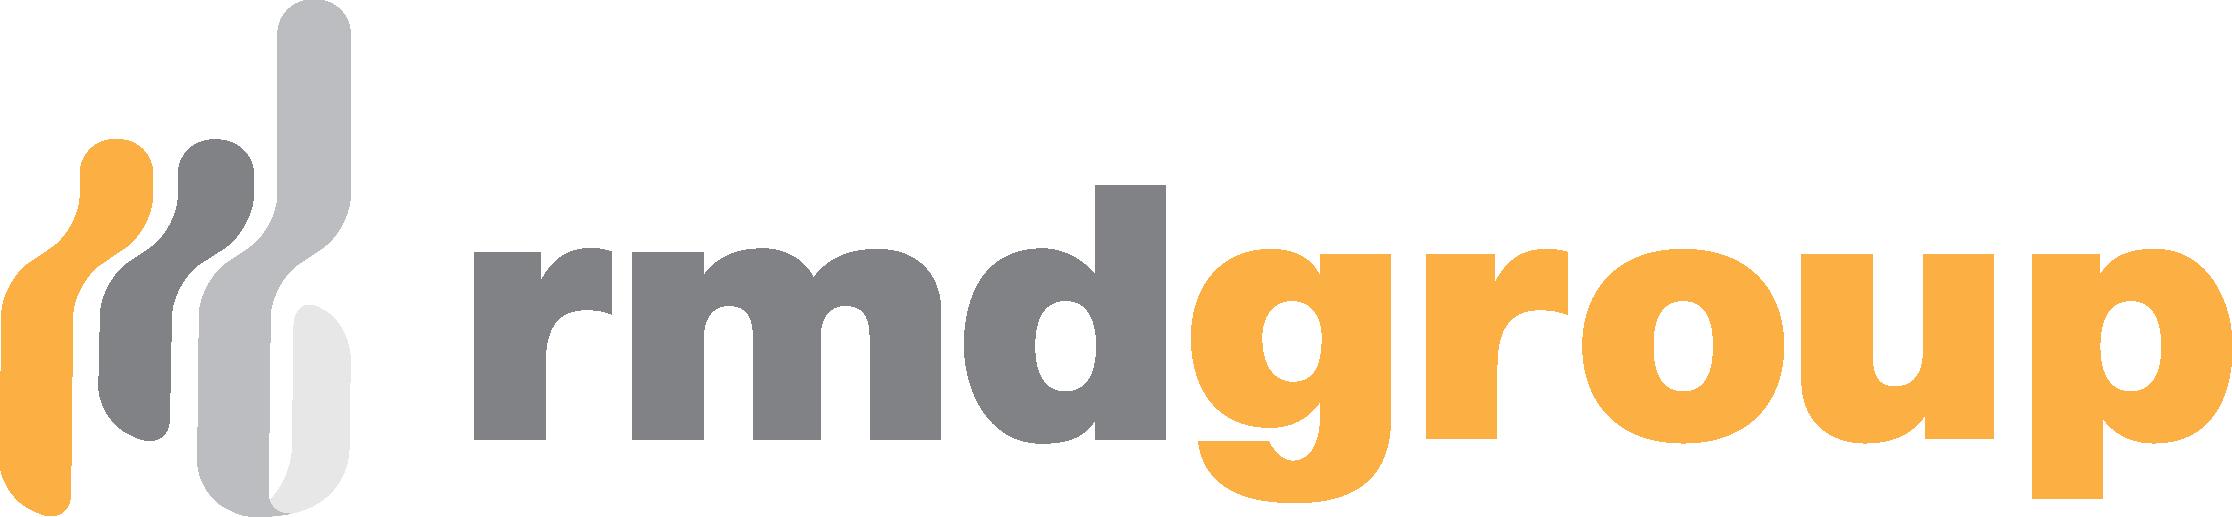 rmdg-1.png